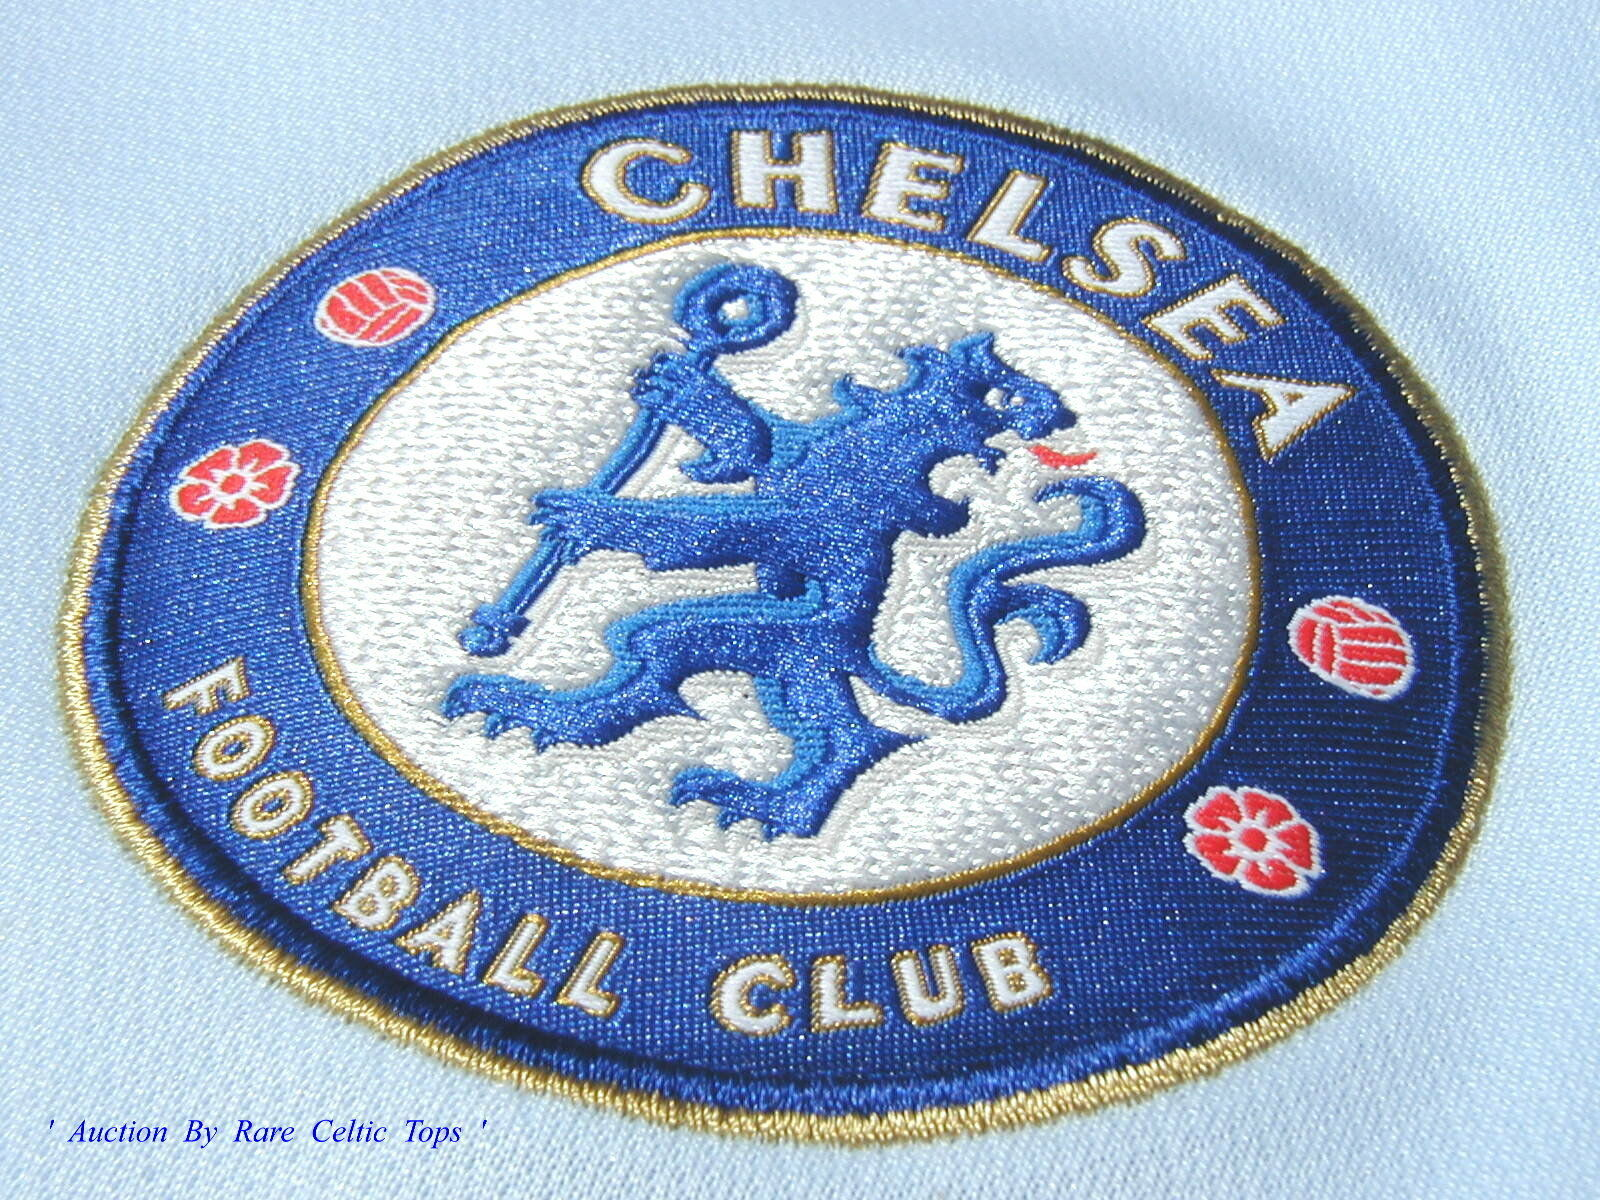 BNWT Umbro Chelsea Footbtutti Club shirt CENTENARIO ANNO Player Issue CL uomoica lunga XXL